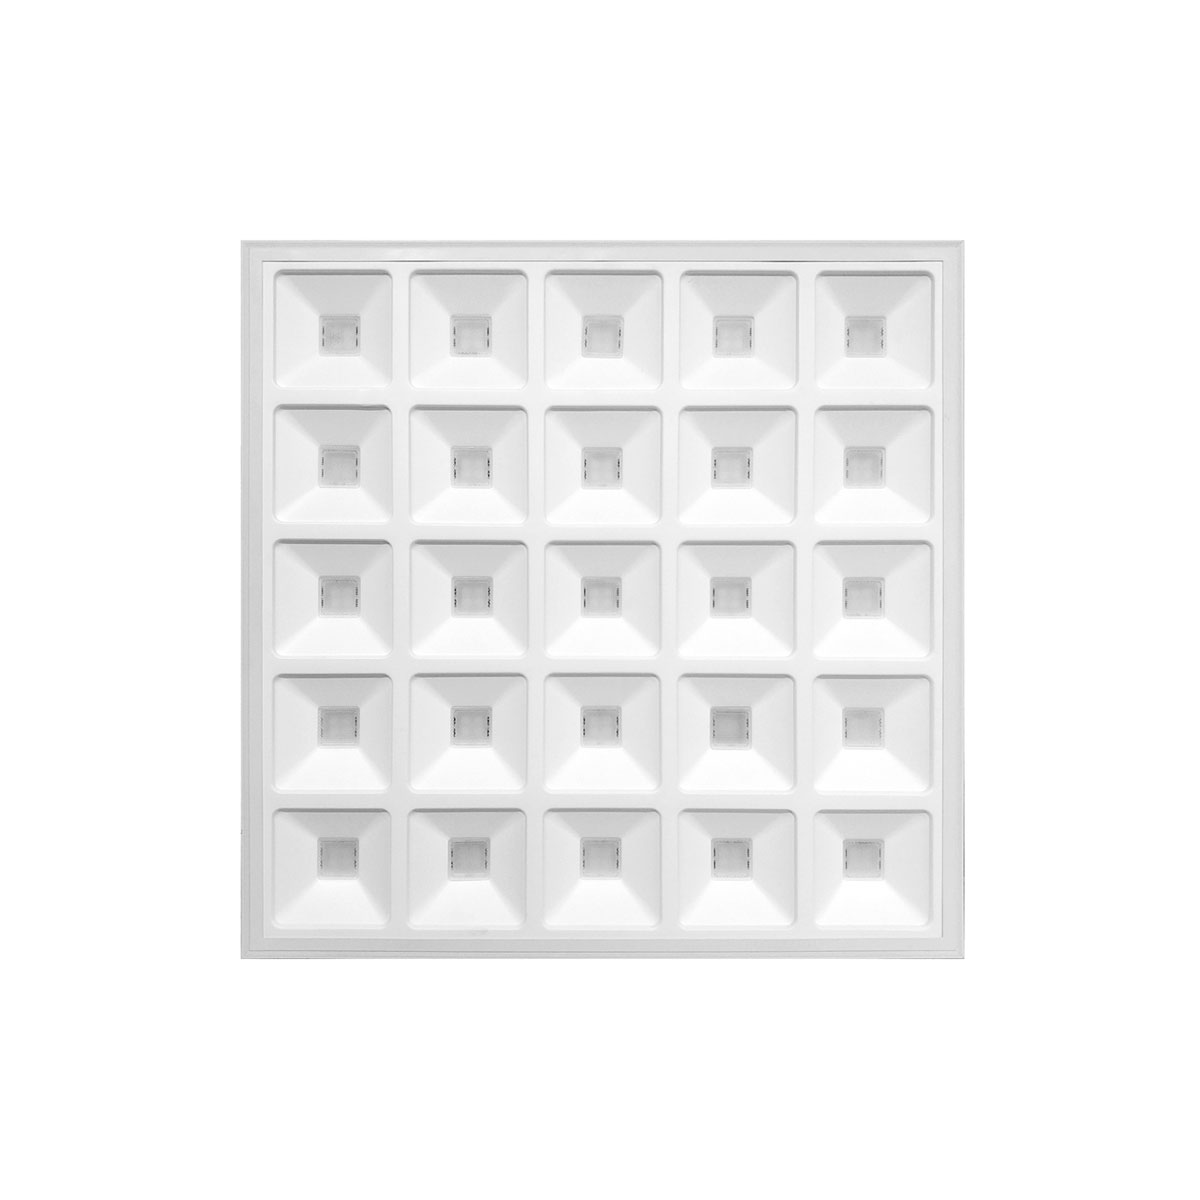 SECOM Professional Lighting Systems - SECOM Iluminación